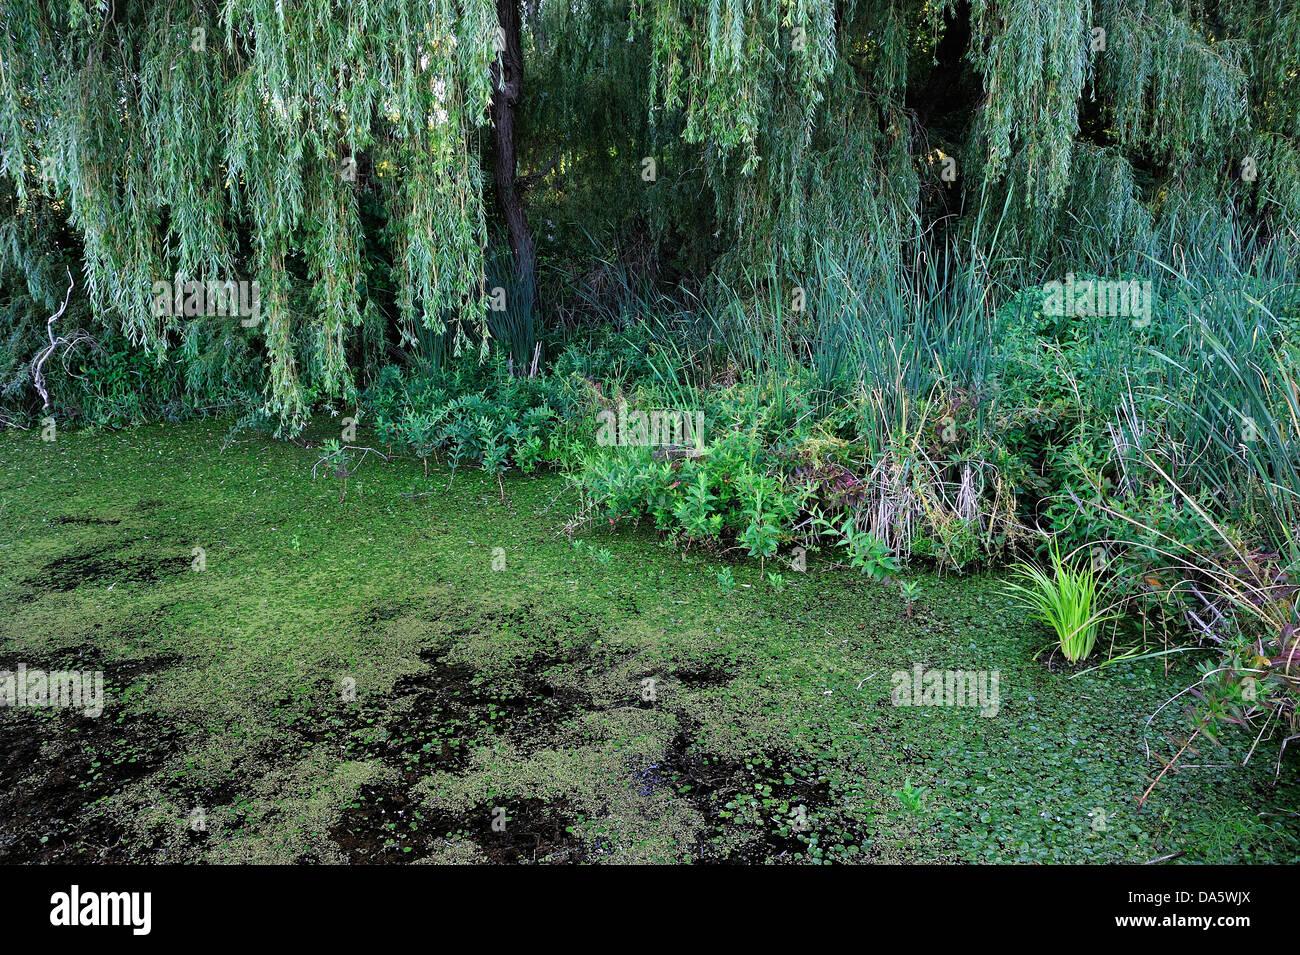 Marshland, marsh, swamp, Sanctuary Pond, Point Pelee, National Park, Leamington, Ontario, Canada, - Stock Image